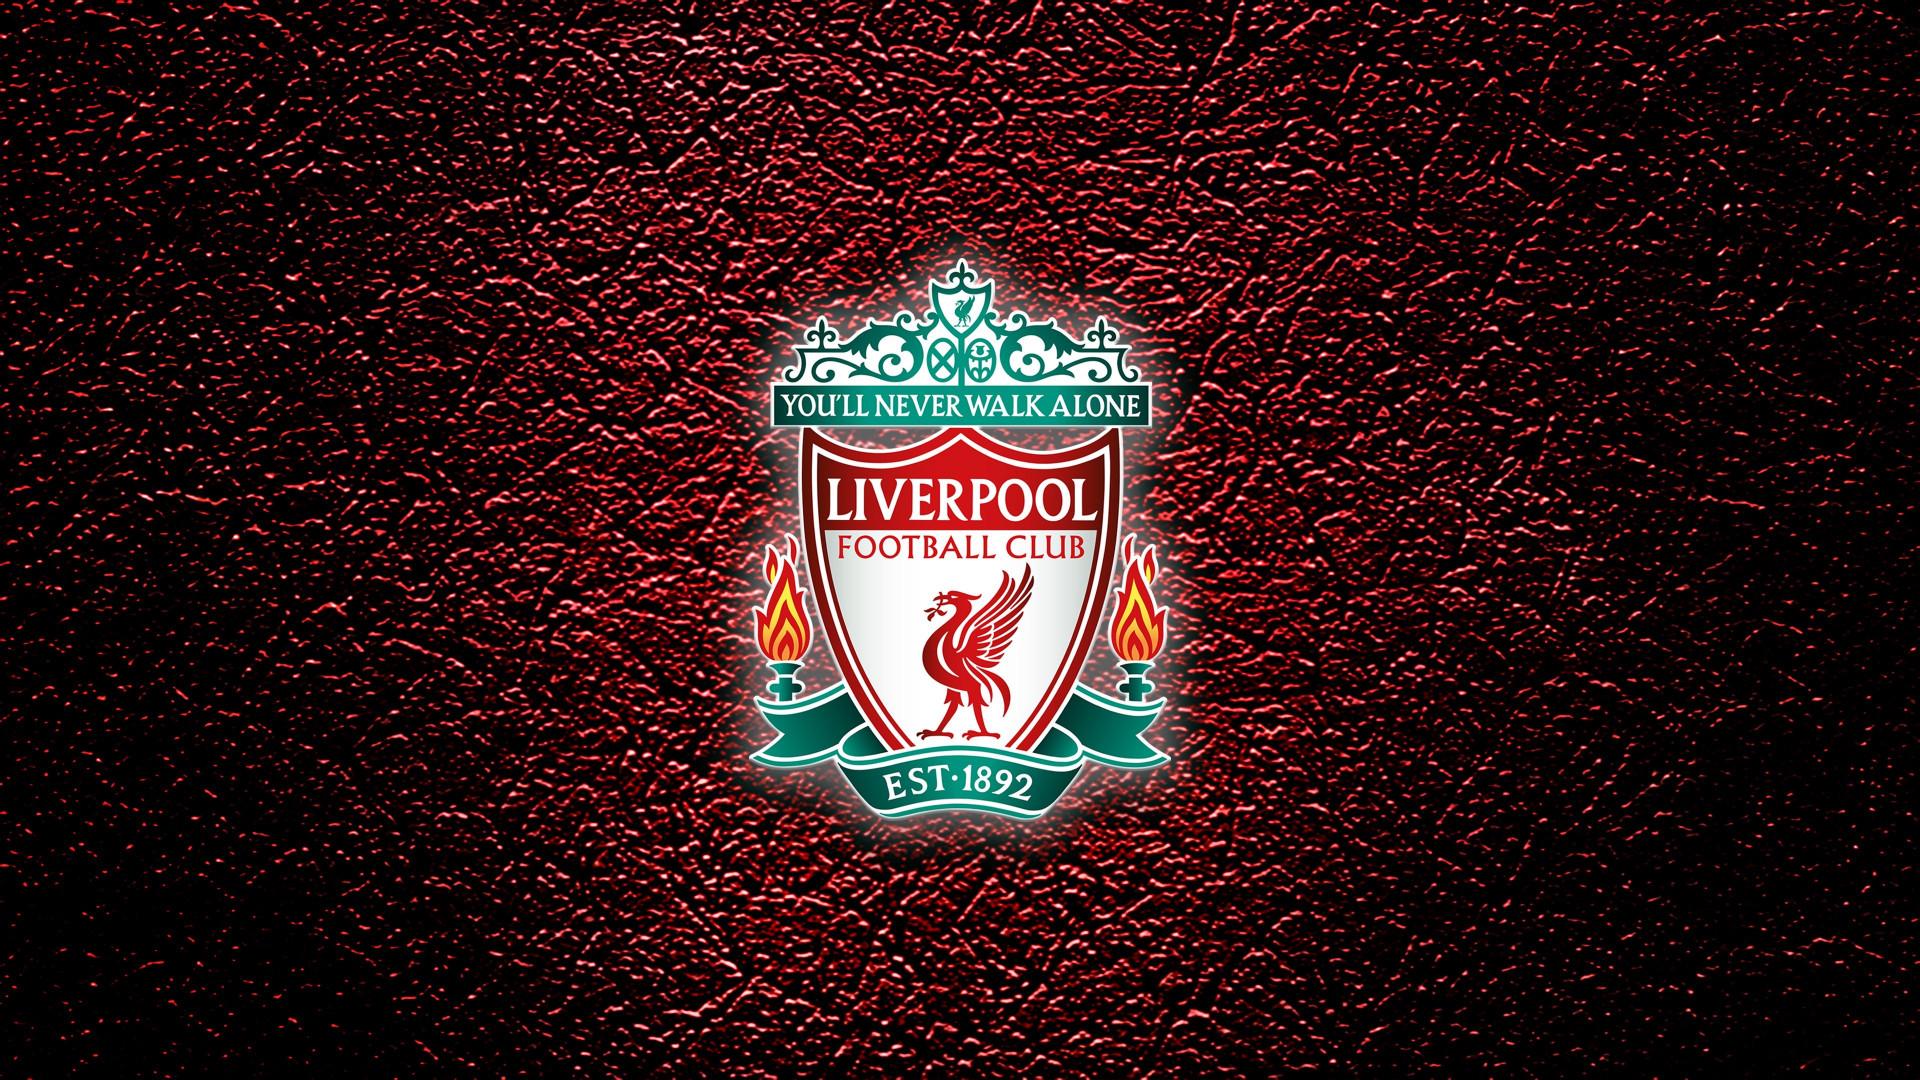 Download Wallpaper Liverpool You Ll Never Walk Alone 1920x1080